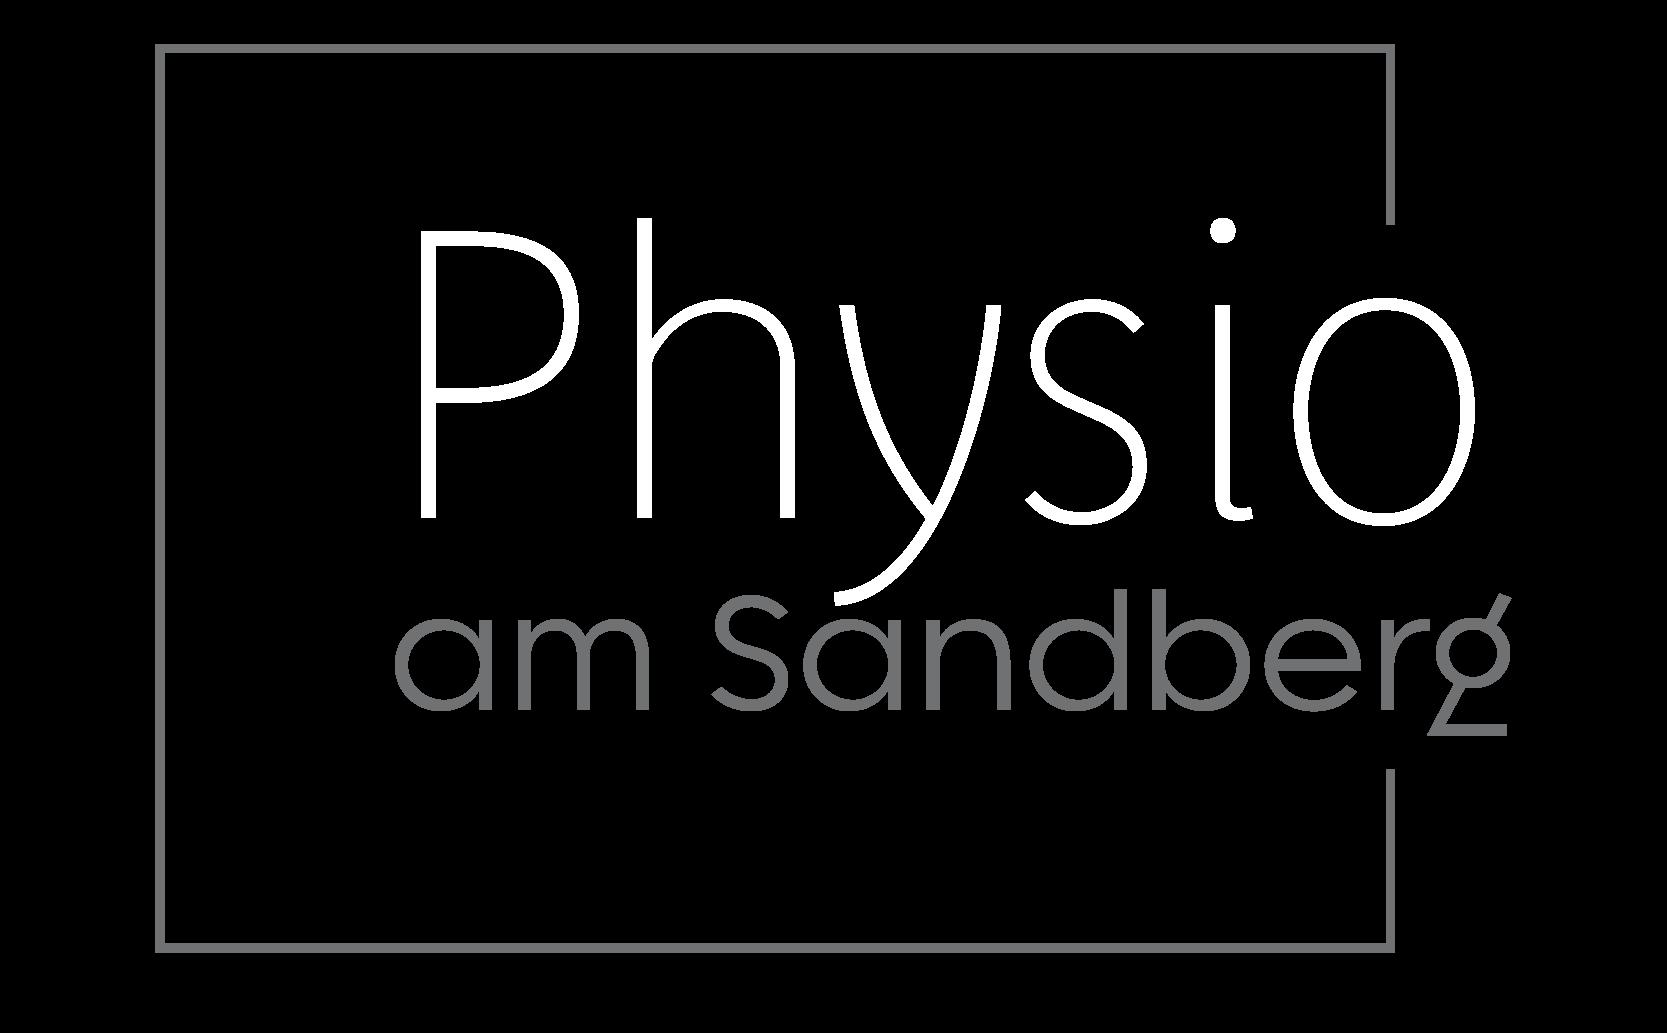 Physio am Sandberg